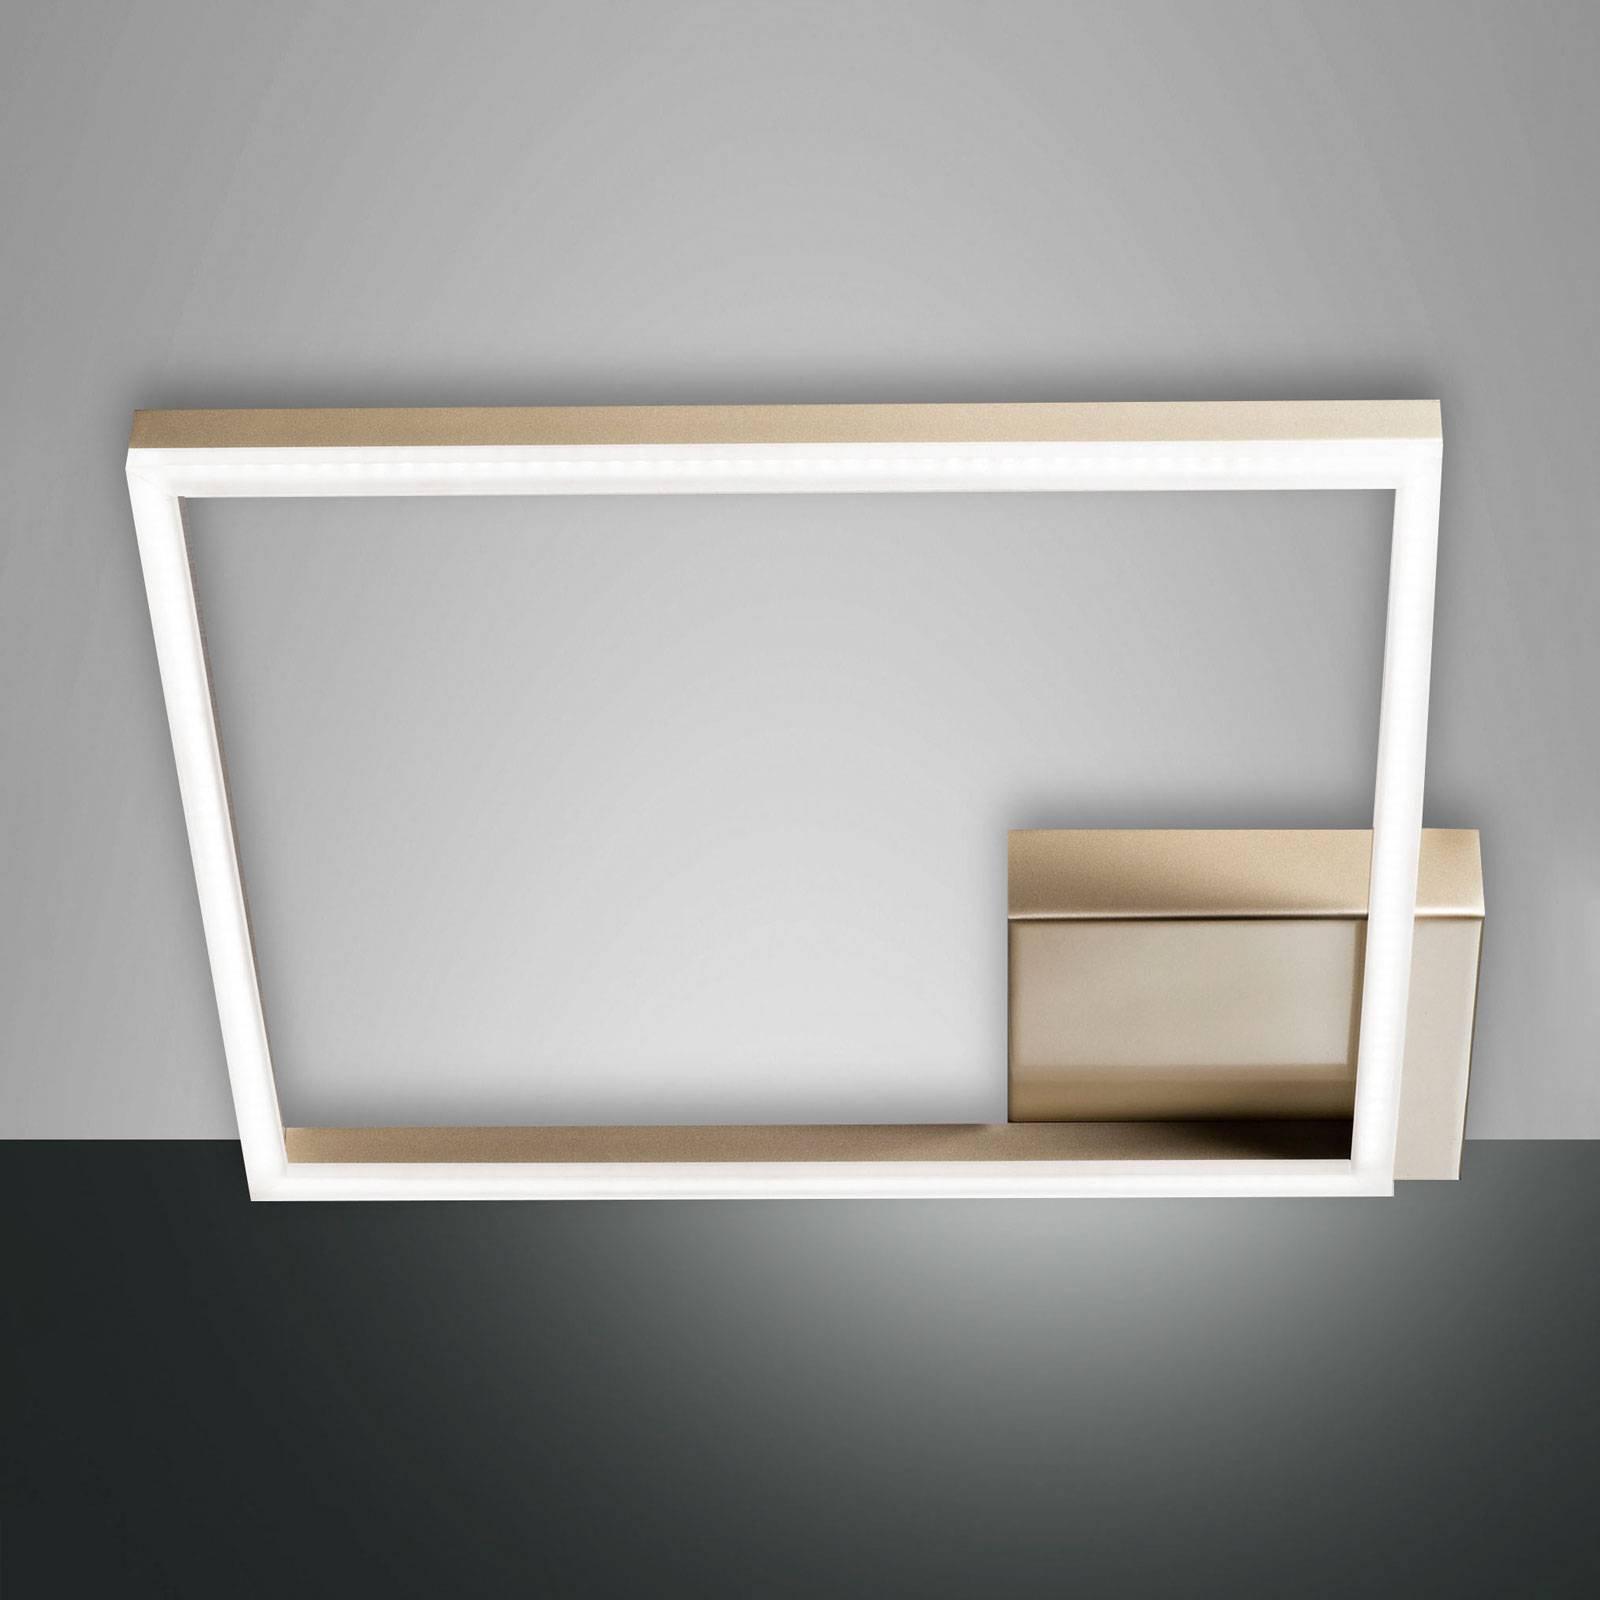 LED-taklampe Bard, 42x42cm, matt gull-finish